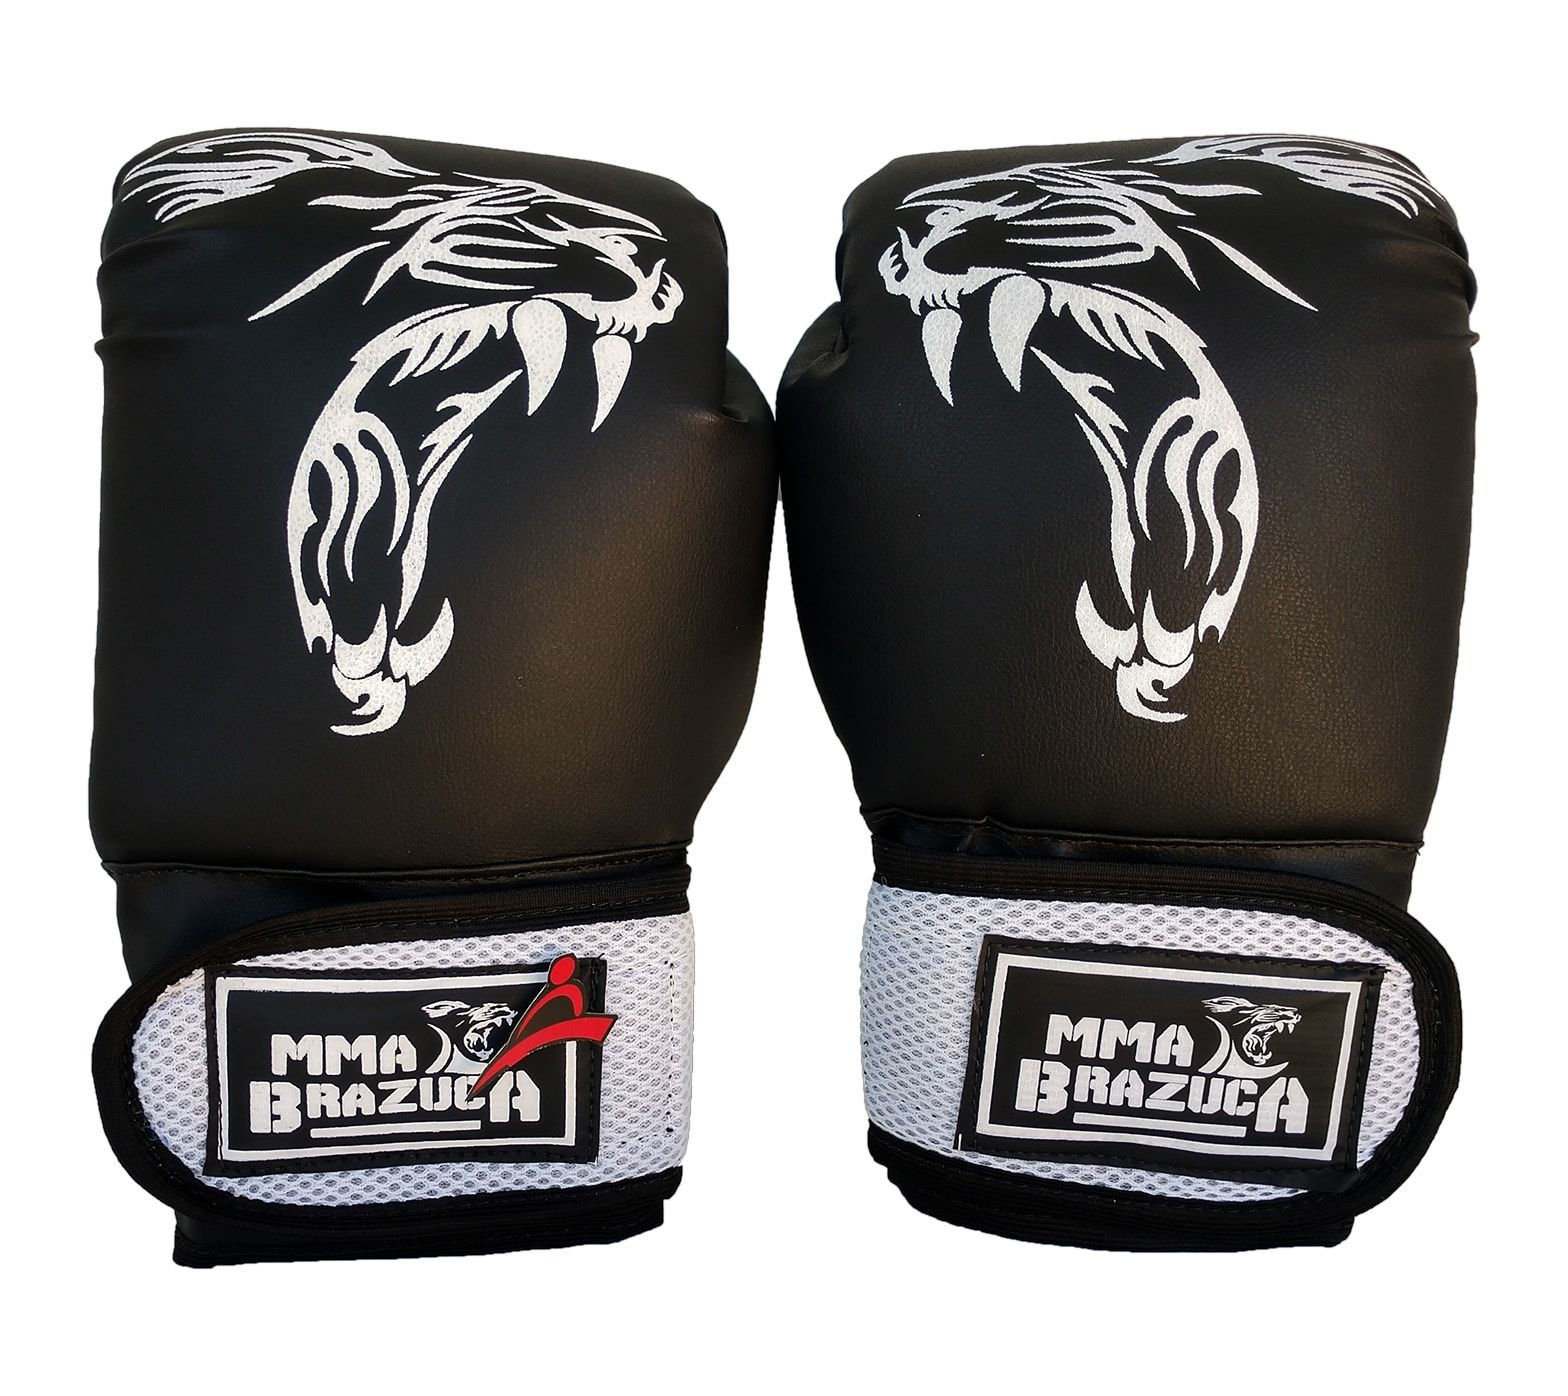 Luva de Boxe / Muay Thai 14oz - Preto com Branco - MMA Brazuka  - PRALUTA SHOP